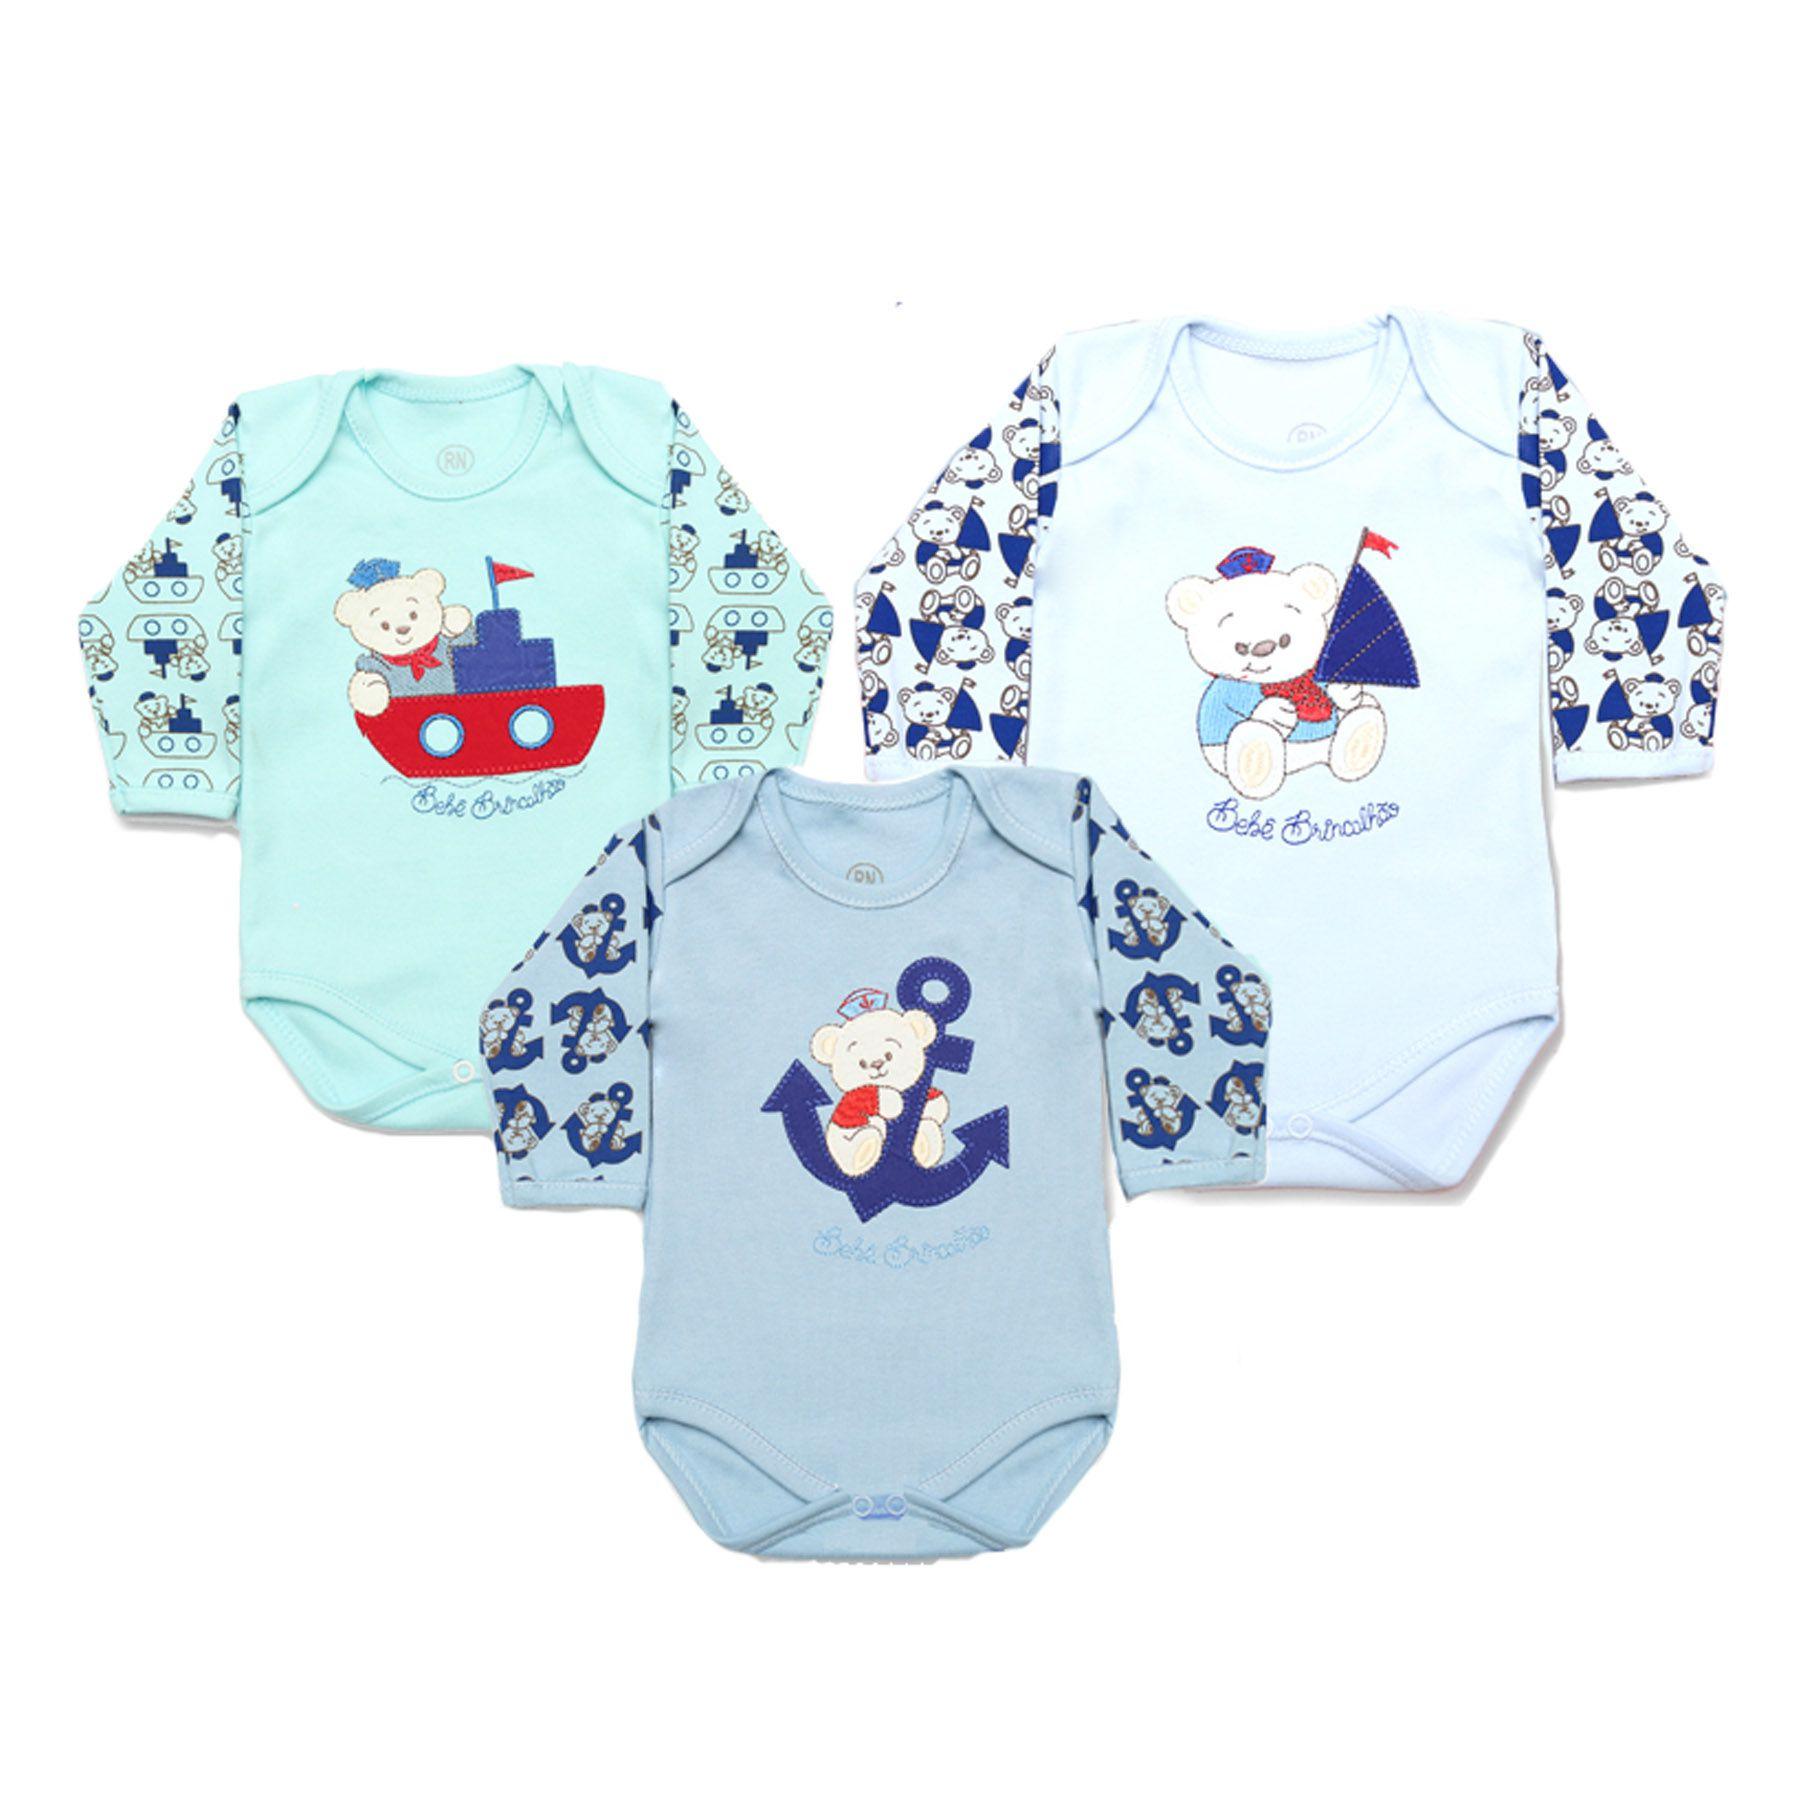 Kit Body Bebê 3 Peças Menino Azul Bordado Marinheiro